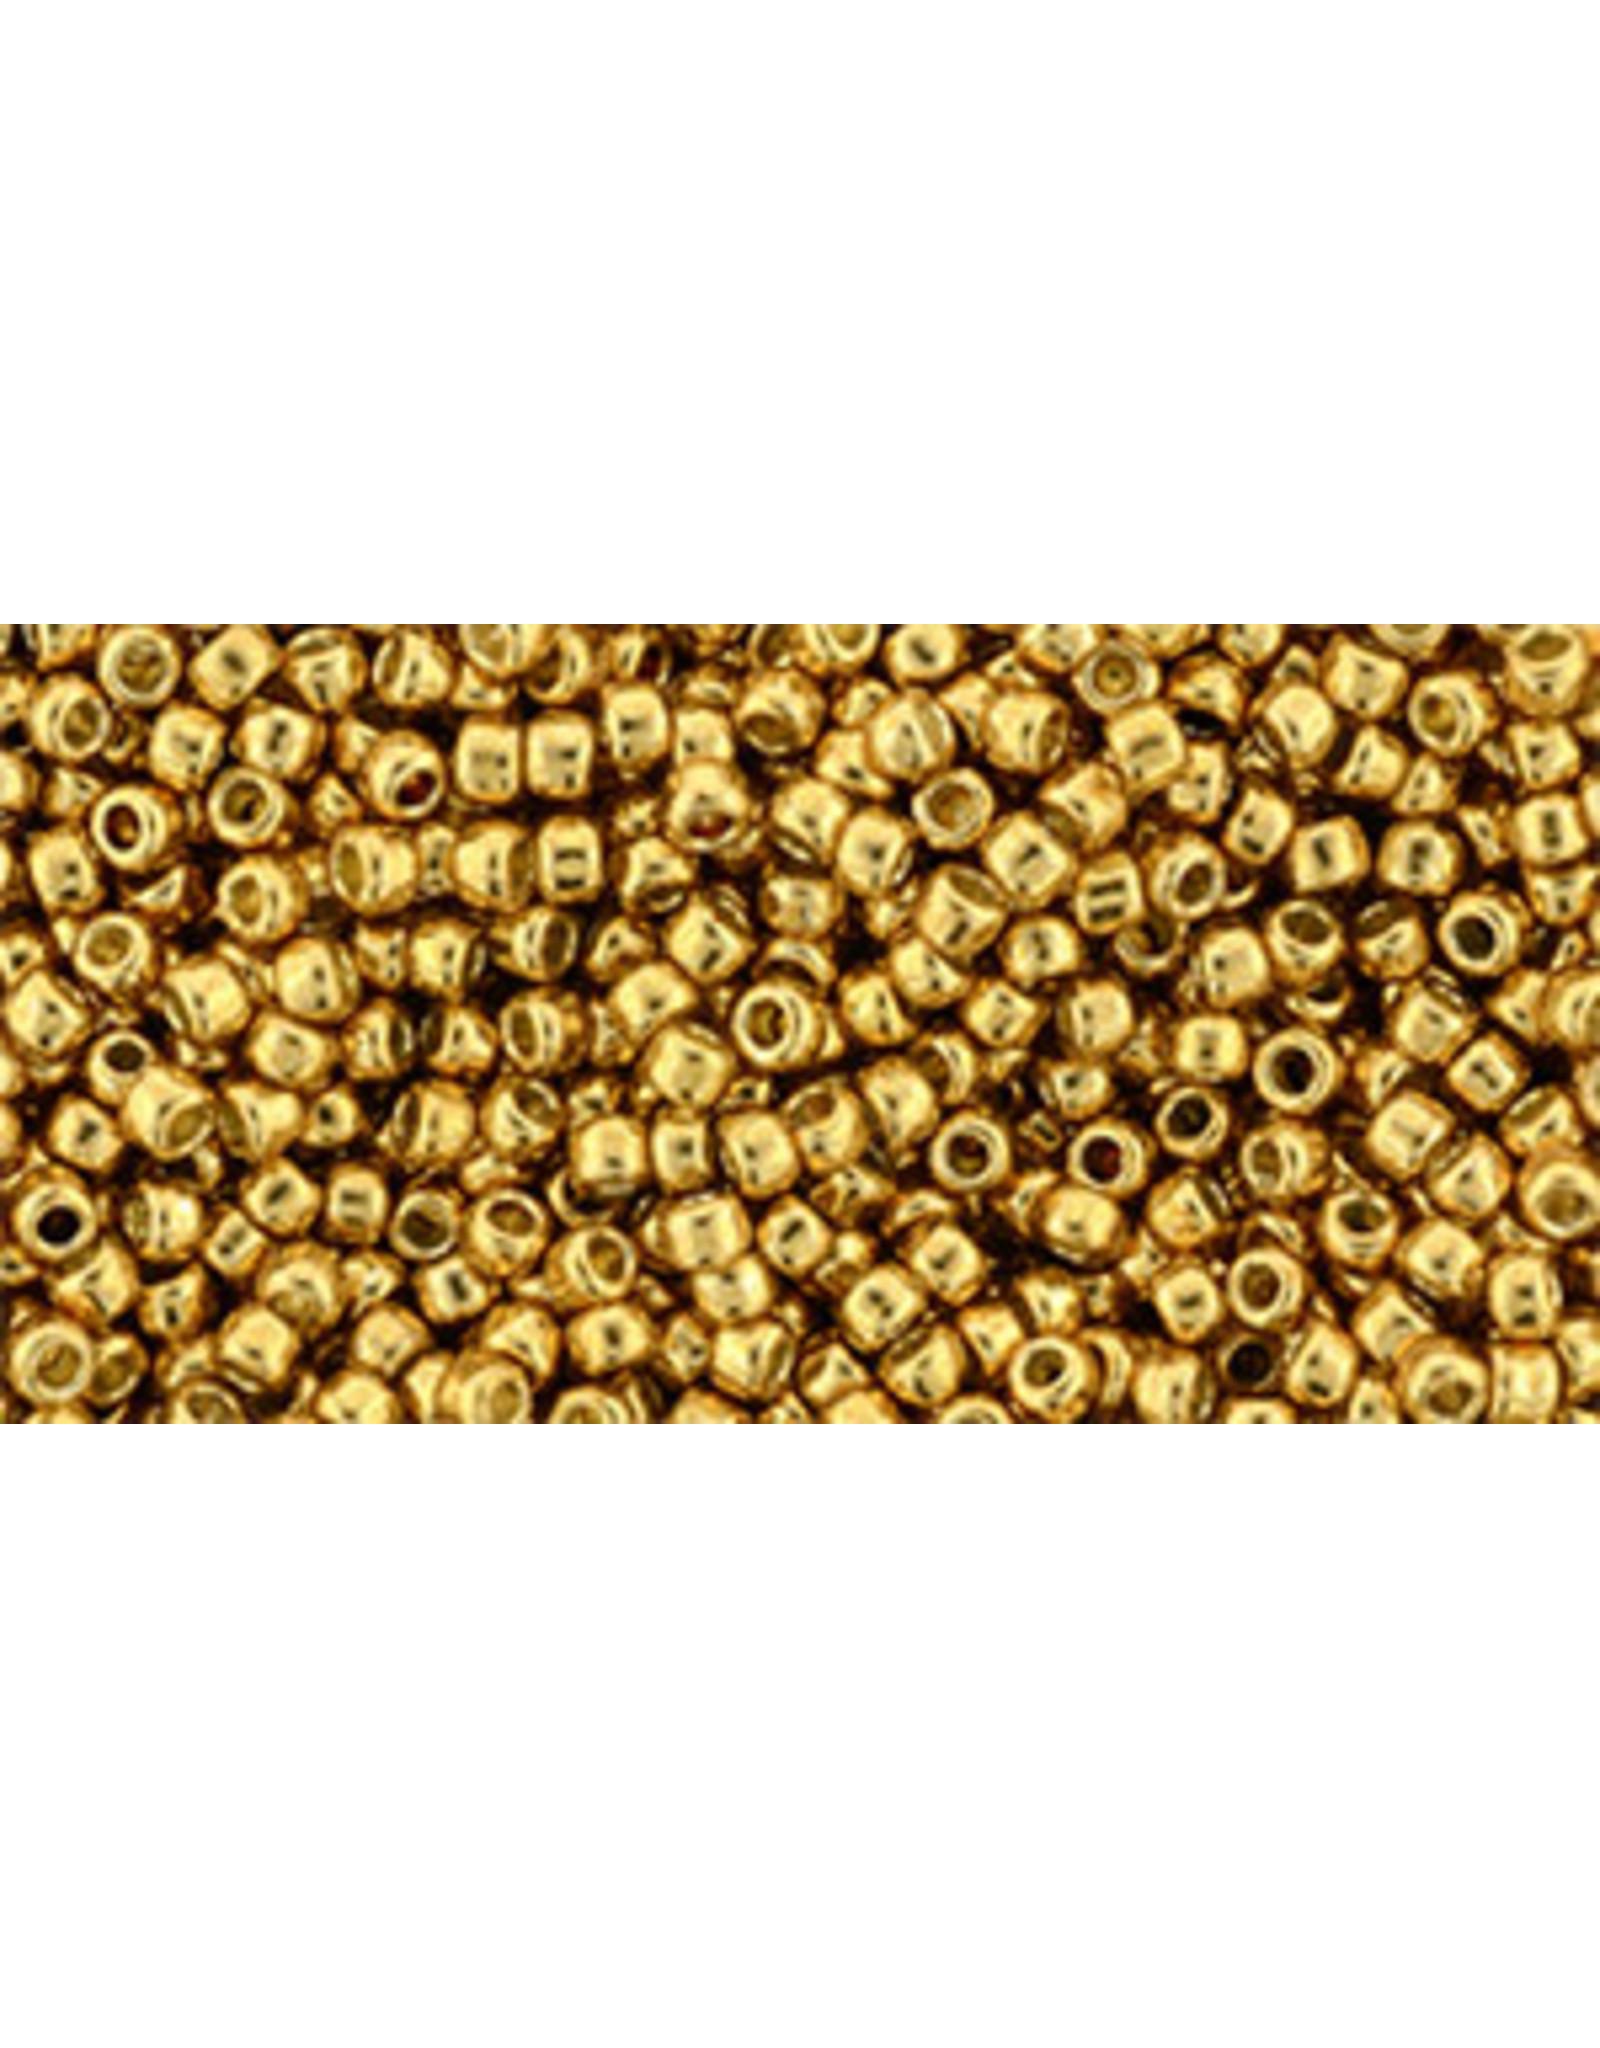 Toho pf591B 11 Toho Round 40g  Old Gold Metallic